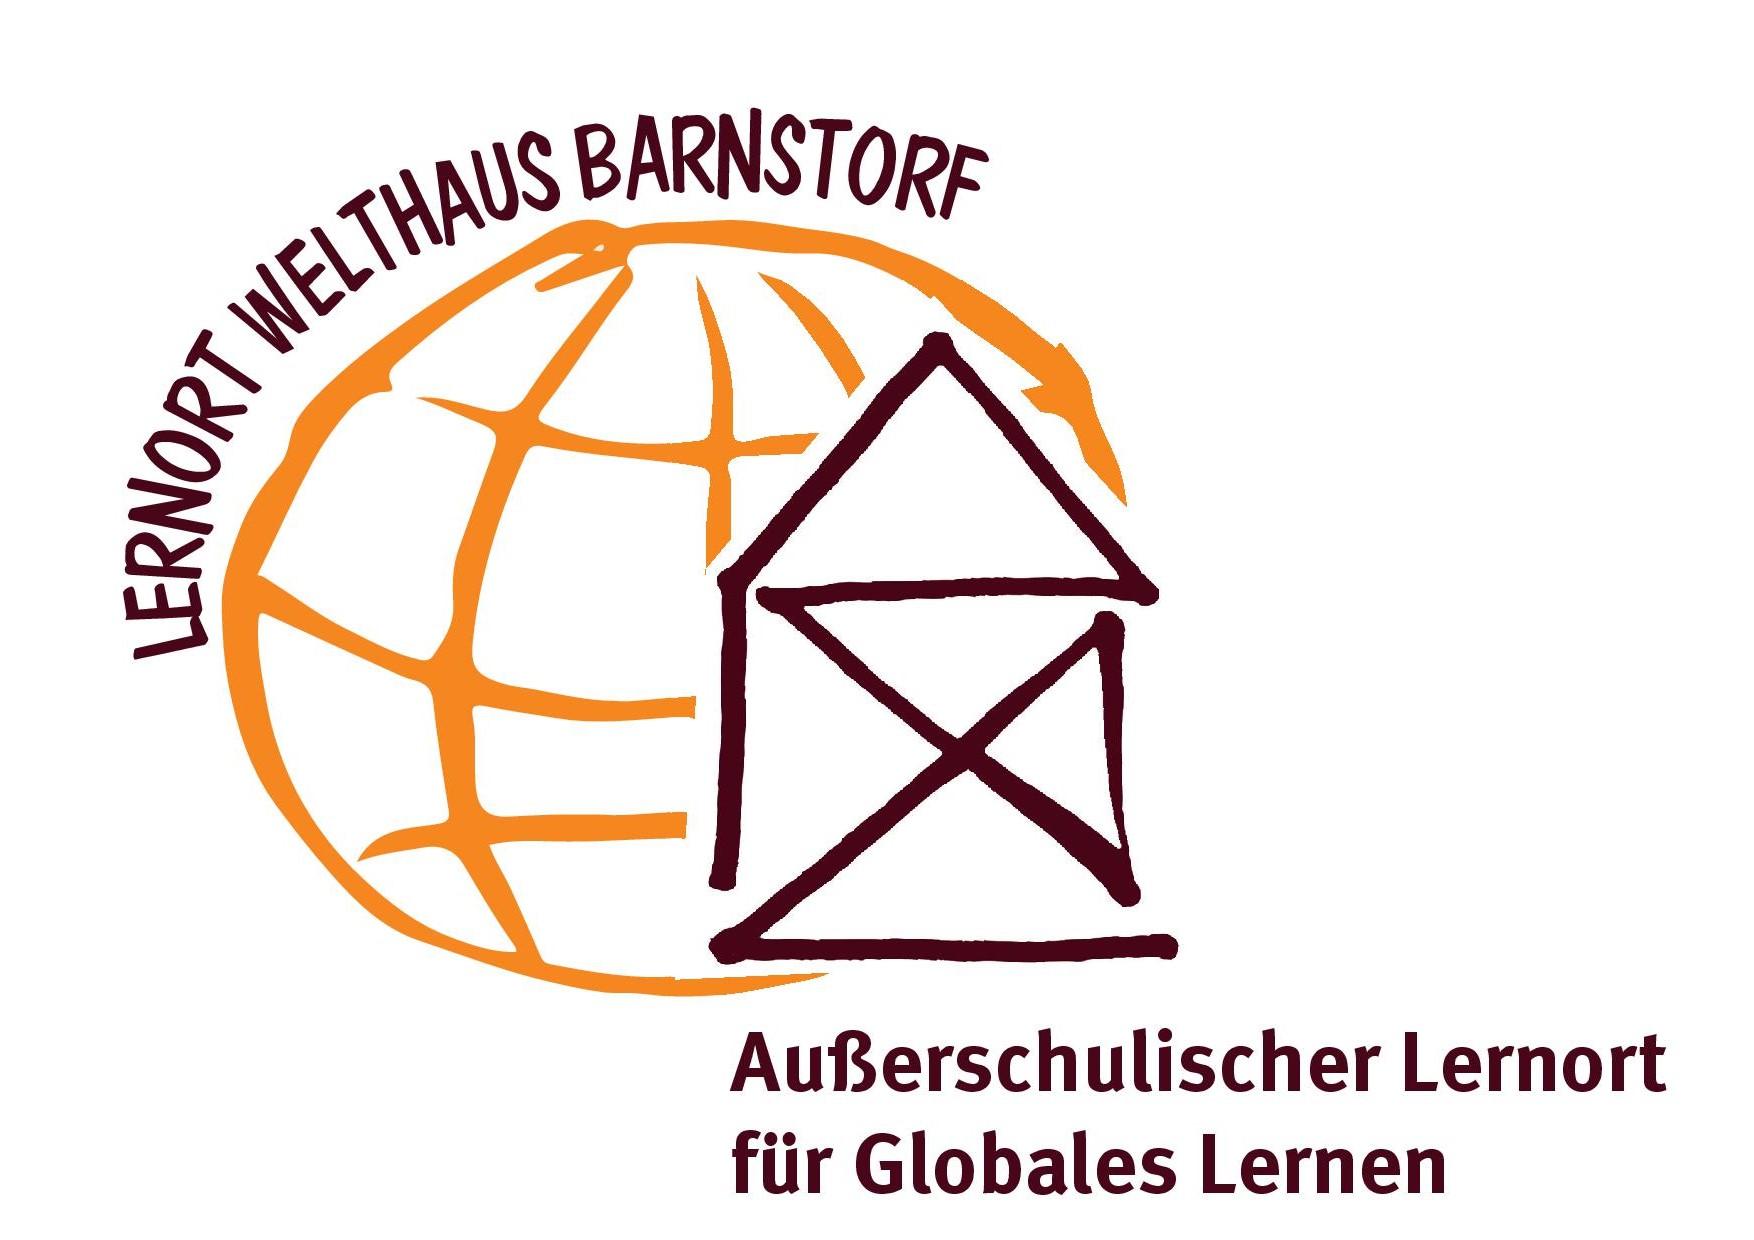 Logo Welthaus Barnstorf. Quelle: annefrankdiepholz.de